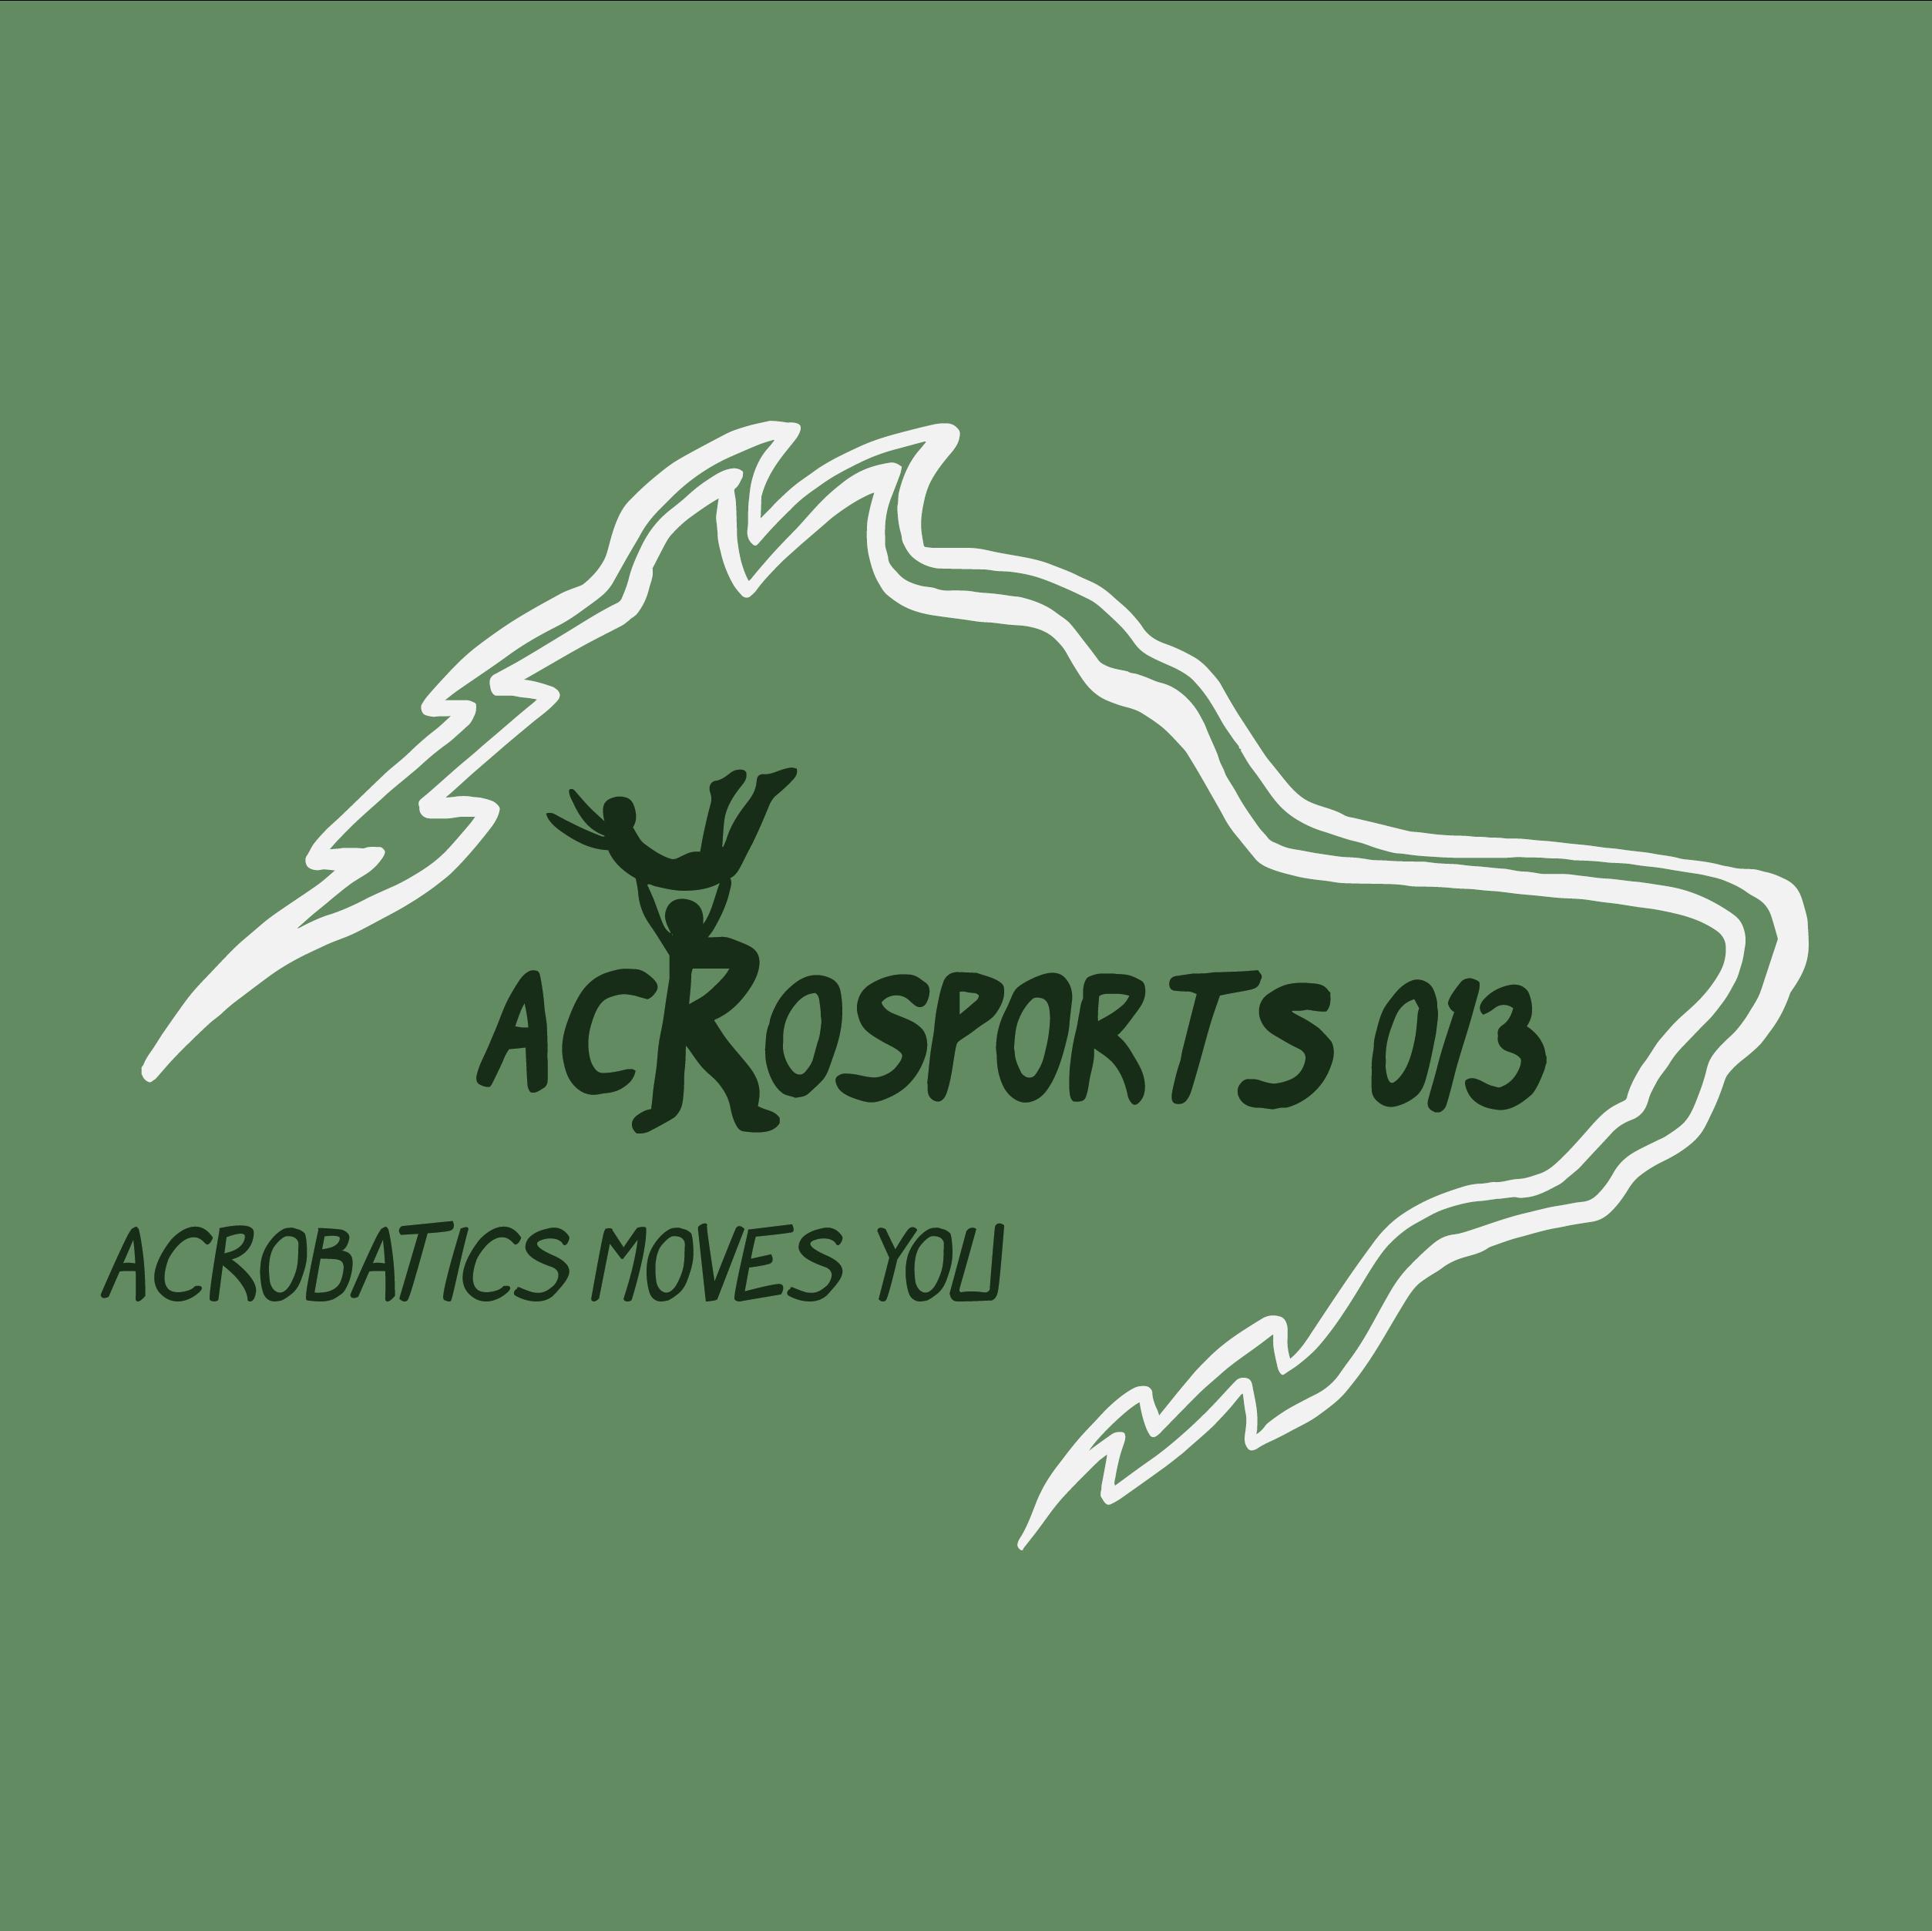 AcroSports 013